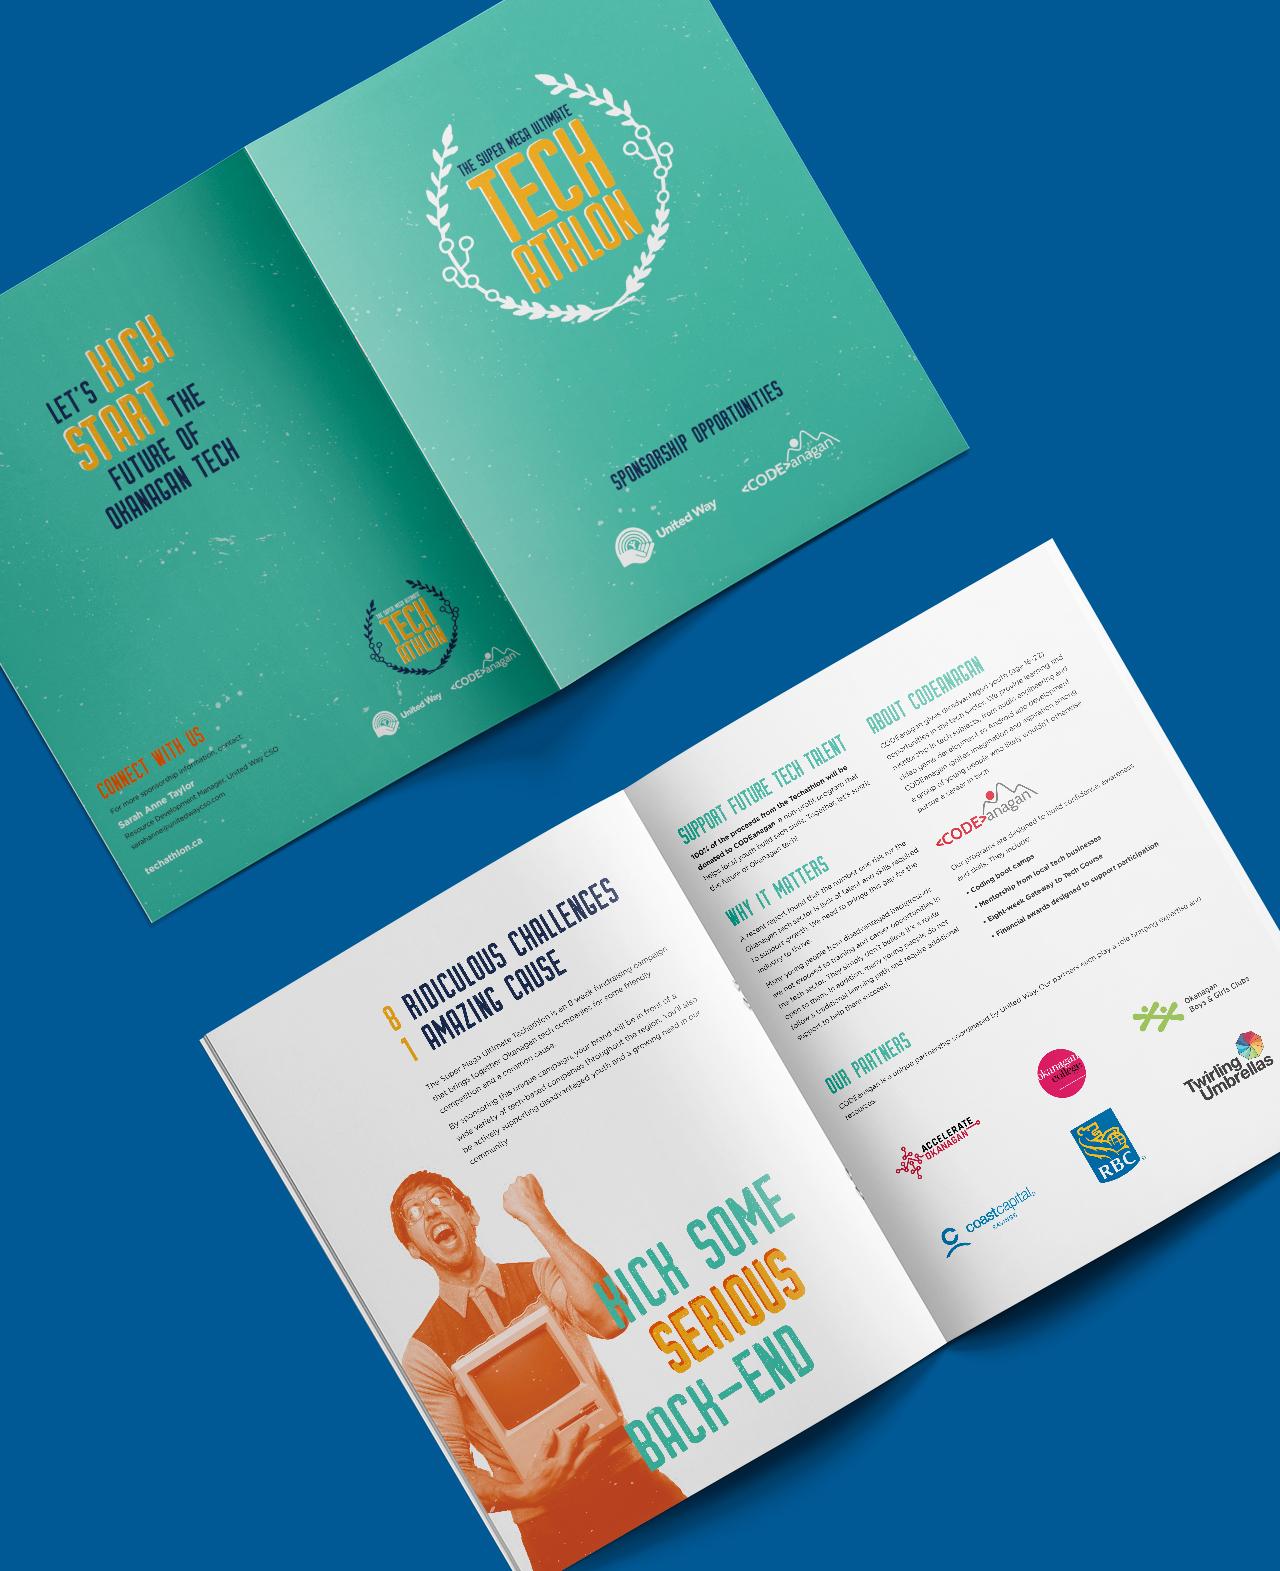 Techathlon Marketing Strategy advertisement spreads on blue background